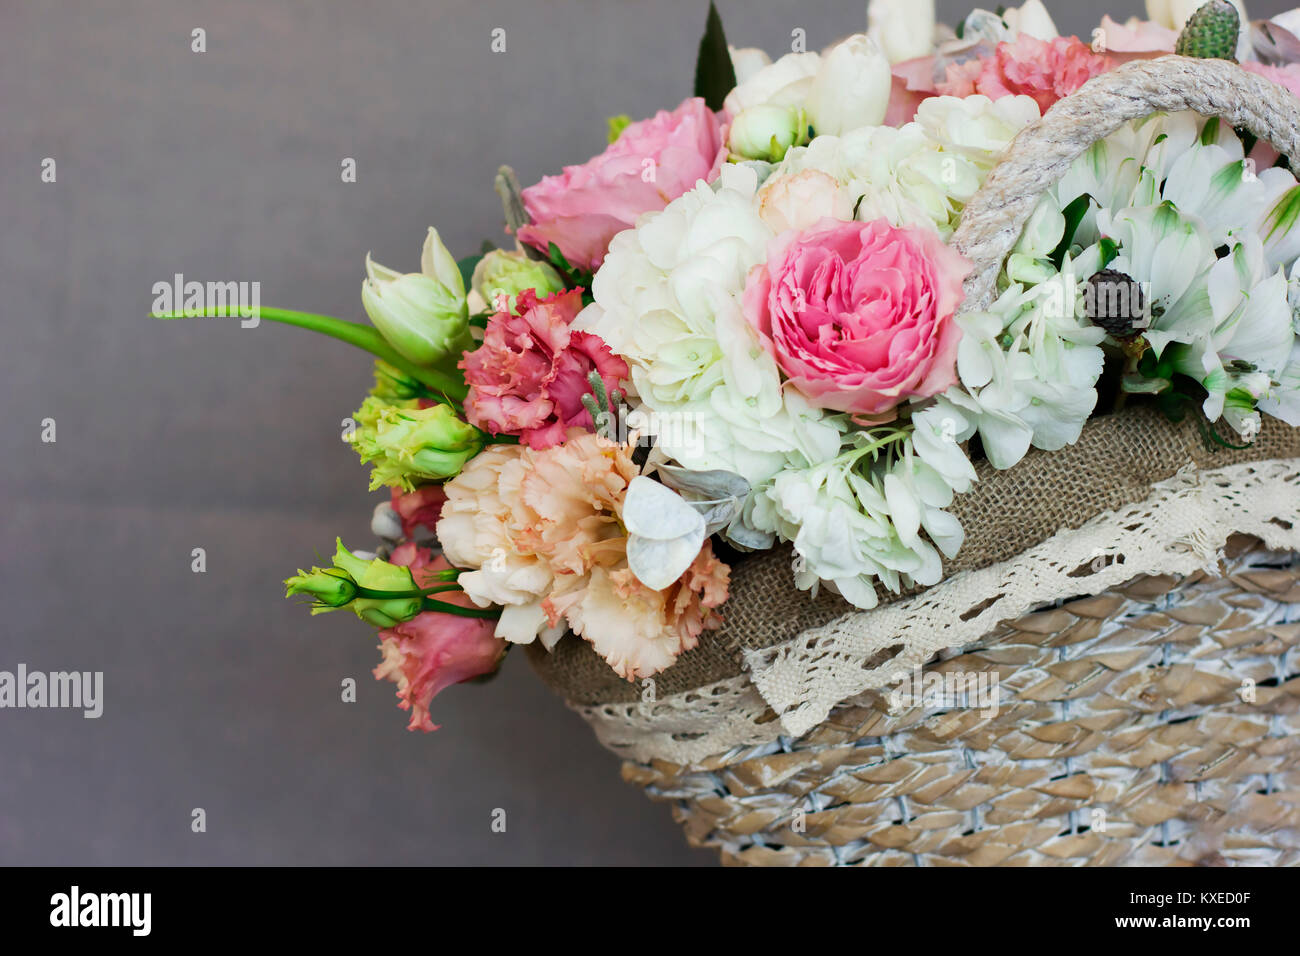 Beautiful Wedding Bouquet Flowers Cotton Stock Photos & Beautiful ...